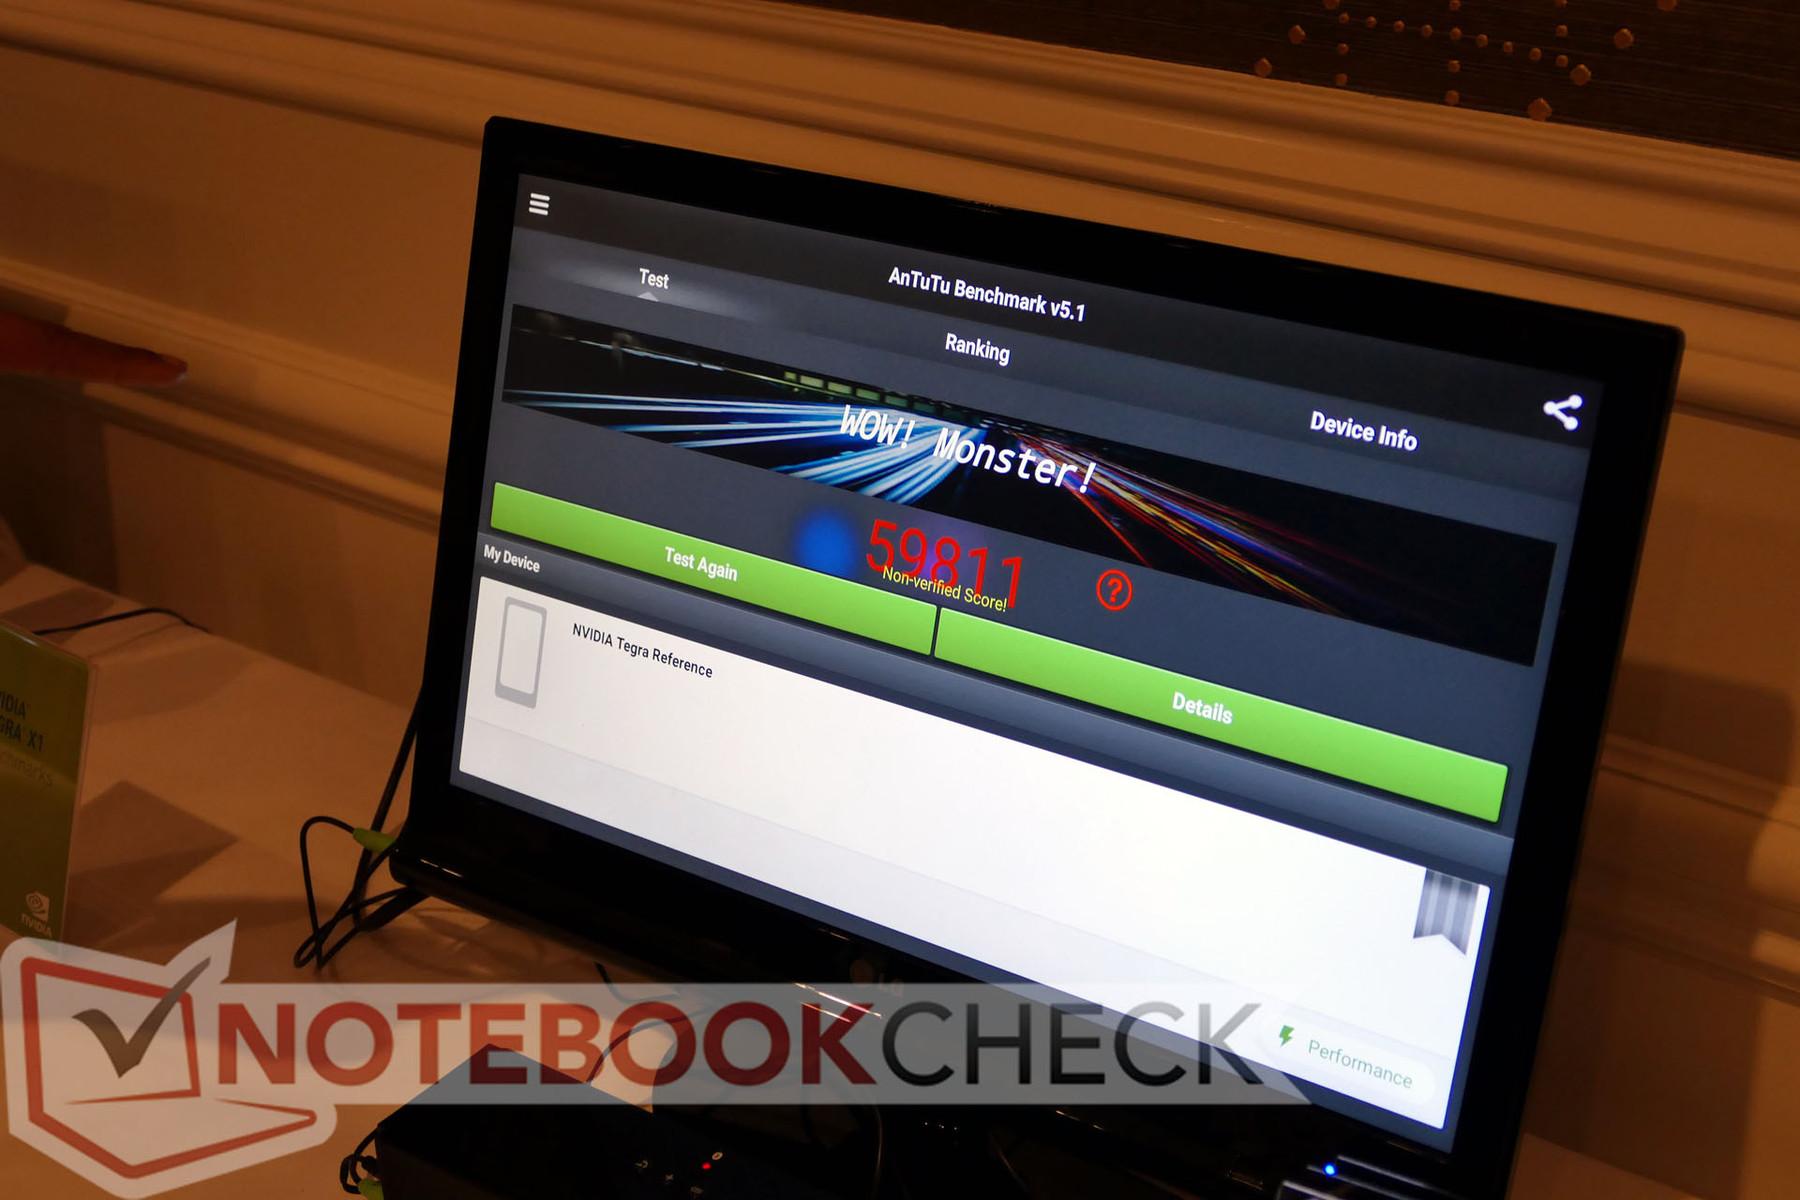 Nvidia announces Tegra X1 SoC